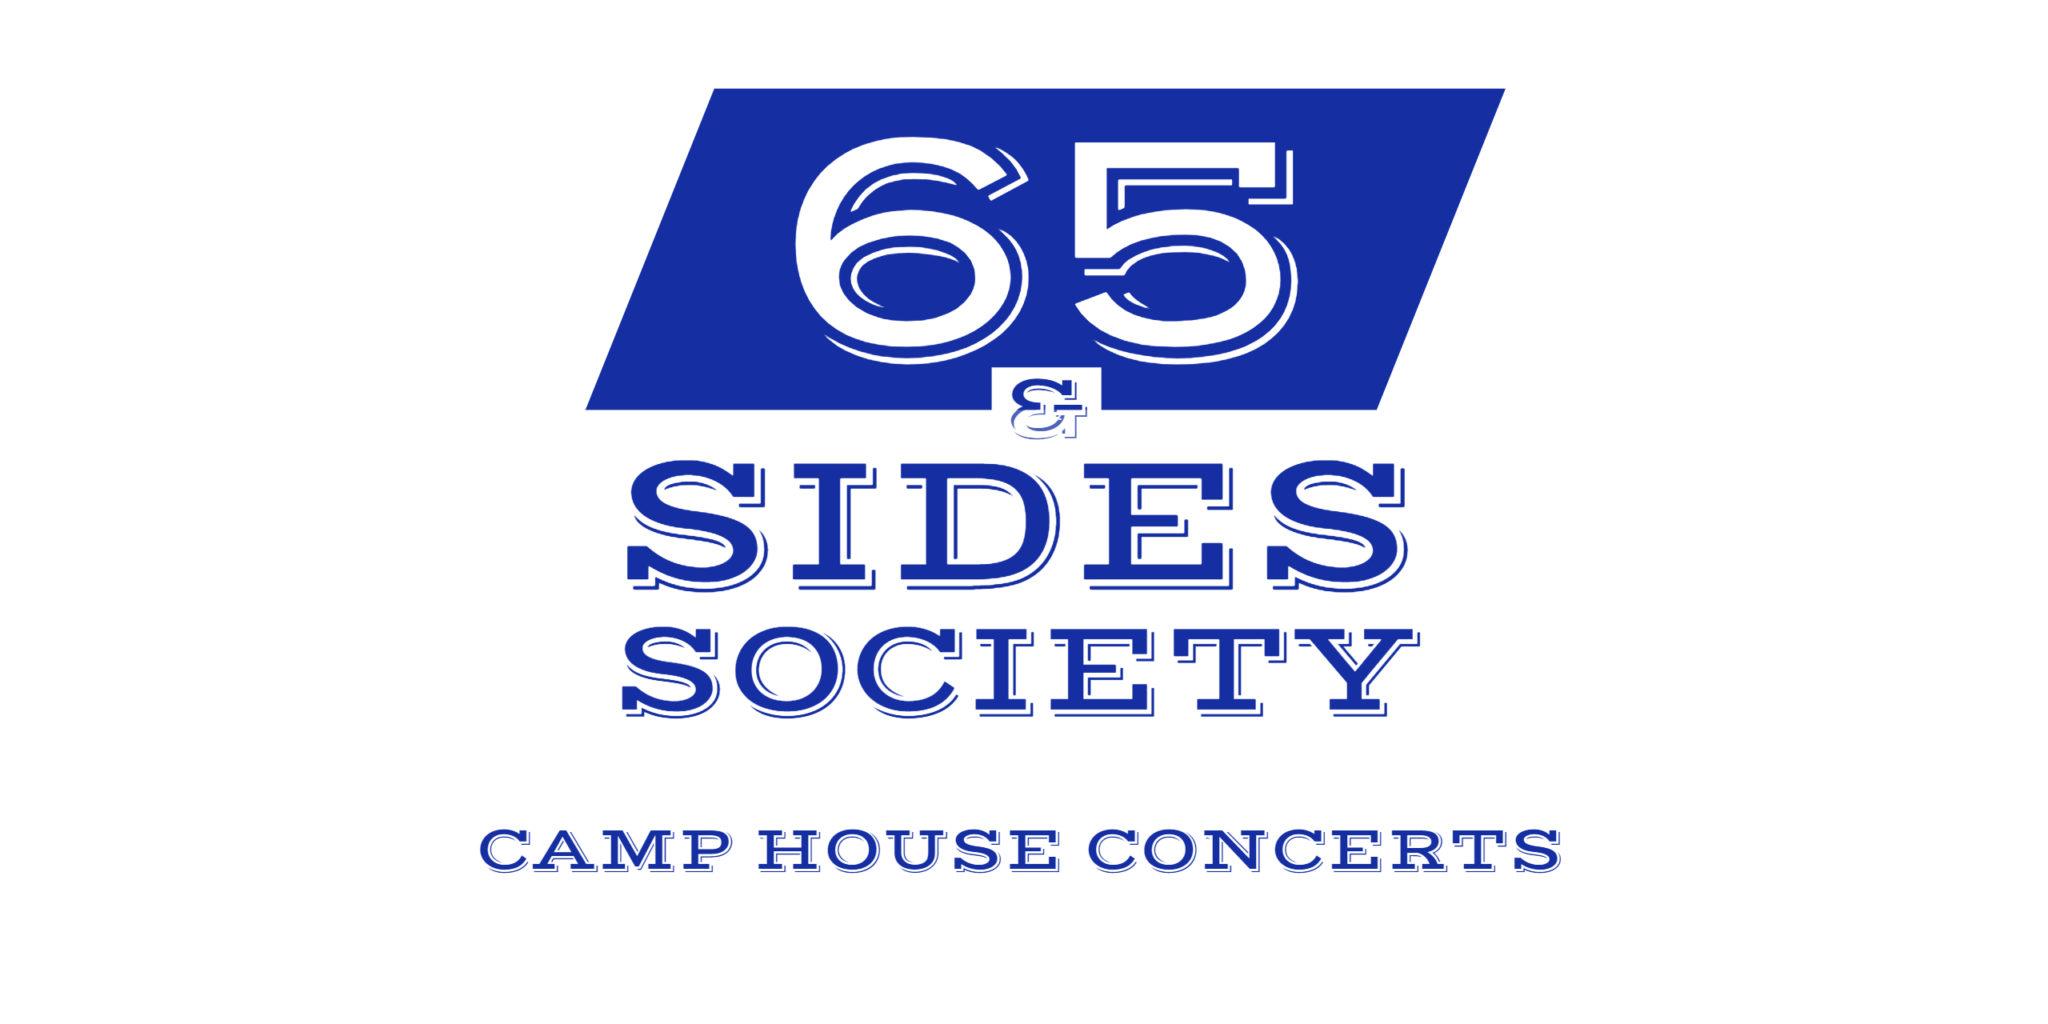 65 & Sides Society Explained